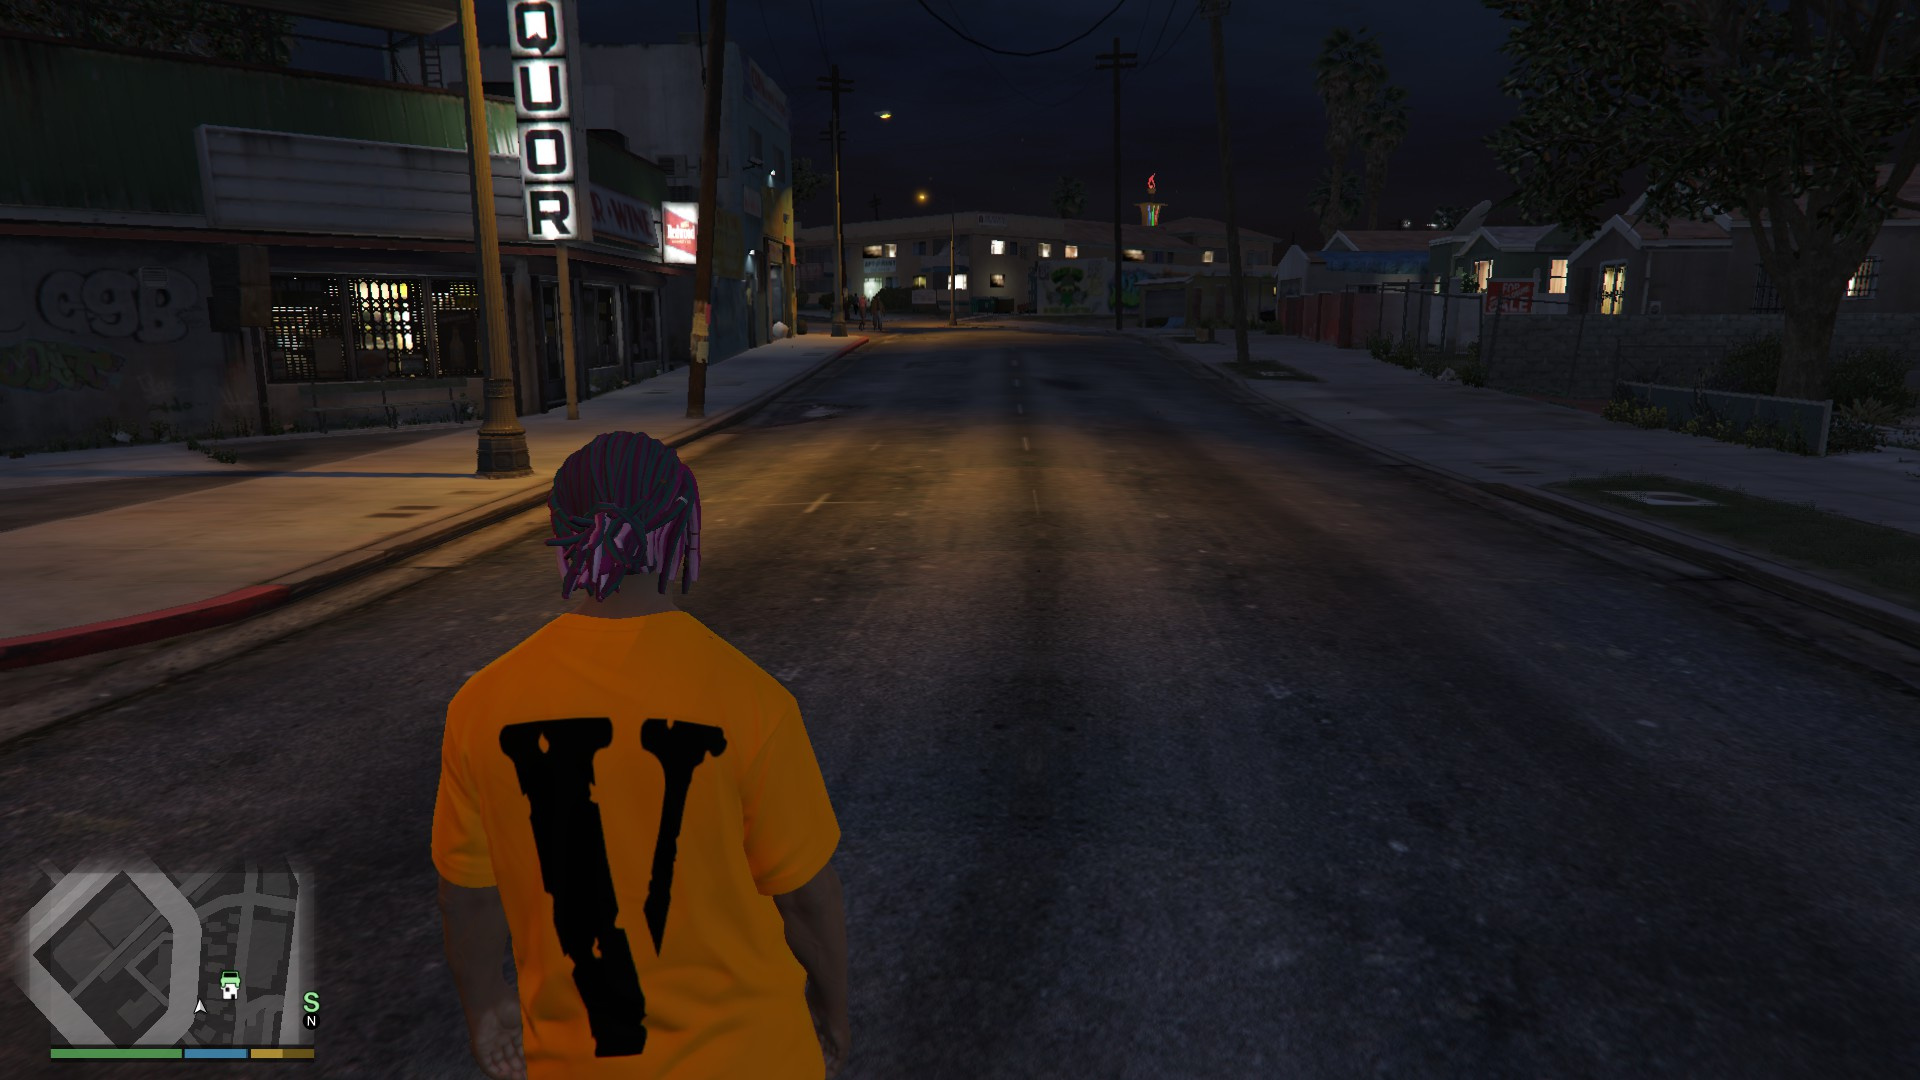 Supreme X Vlone T Shirt Gta5 Mods Com